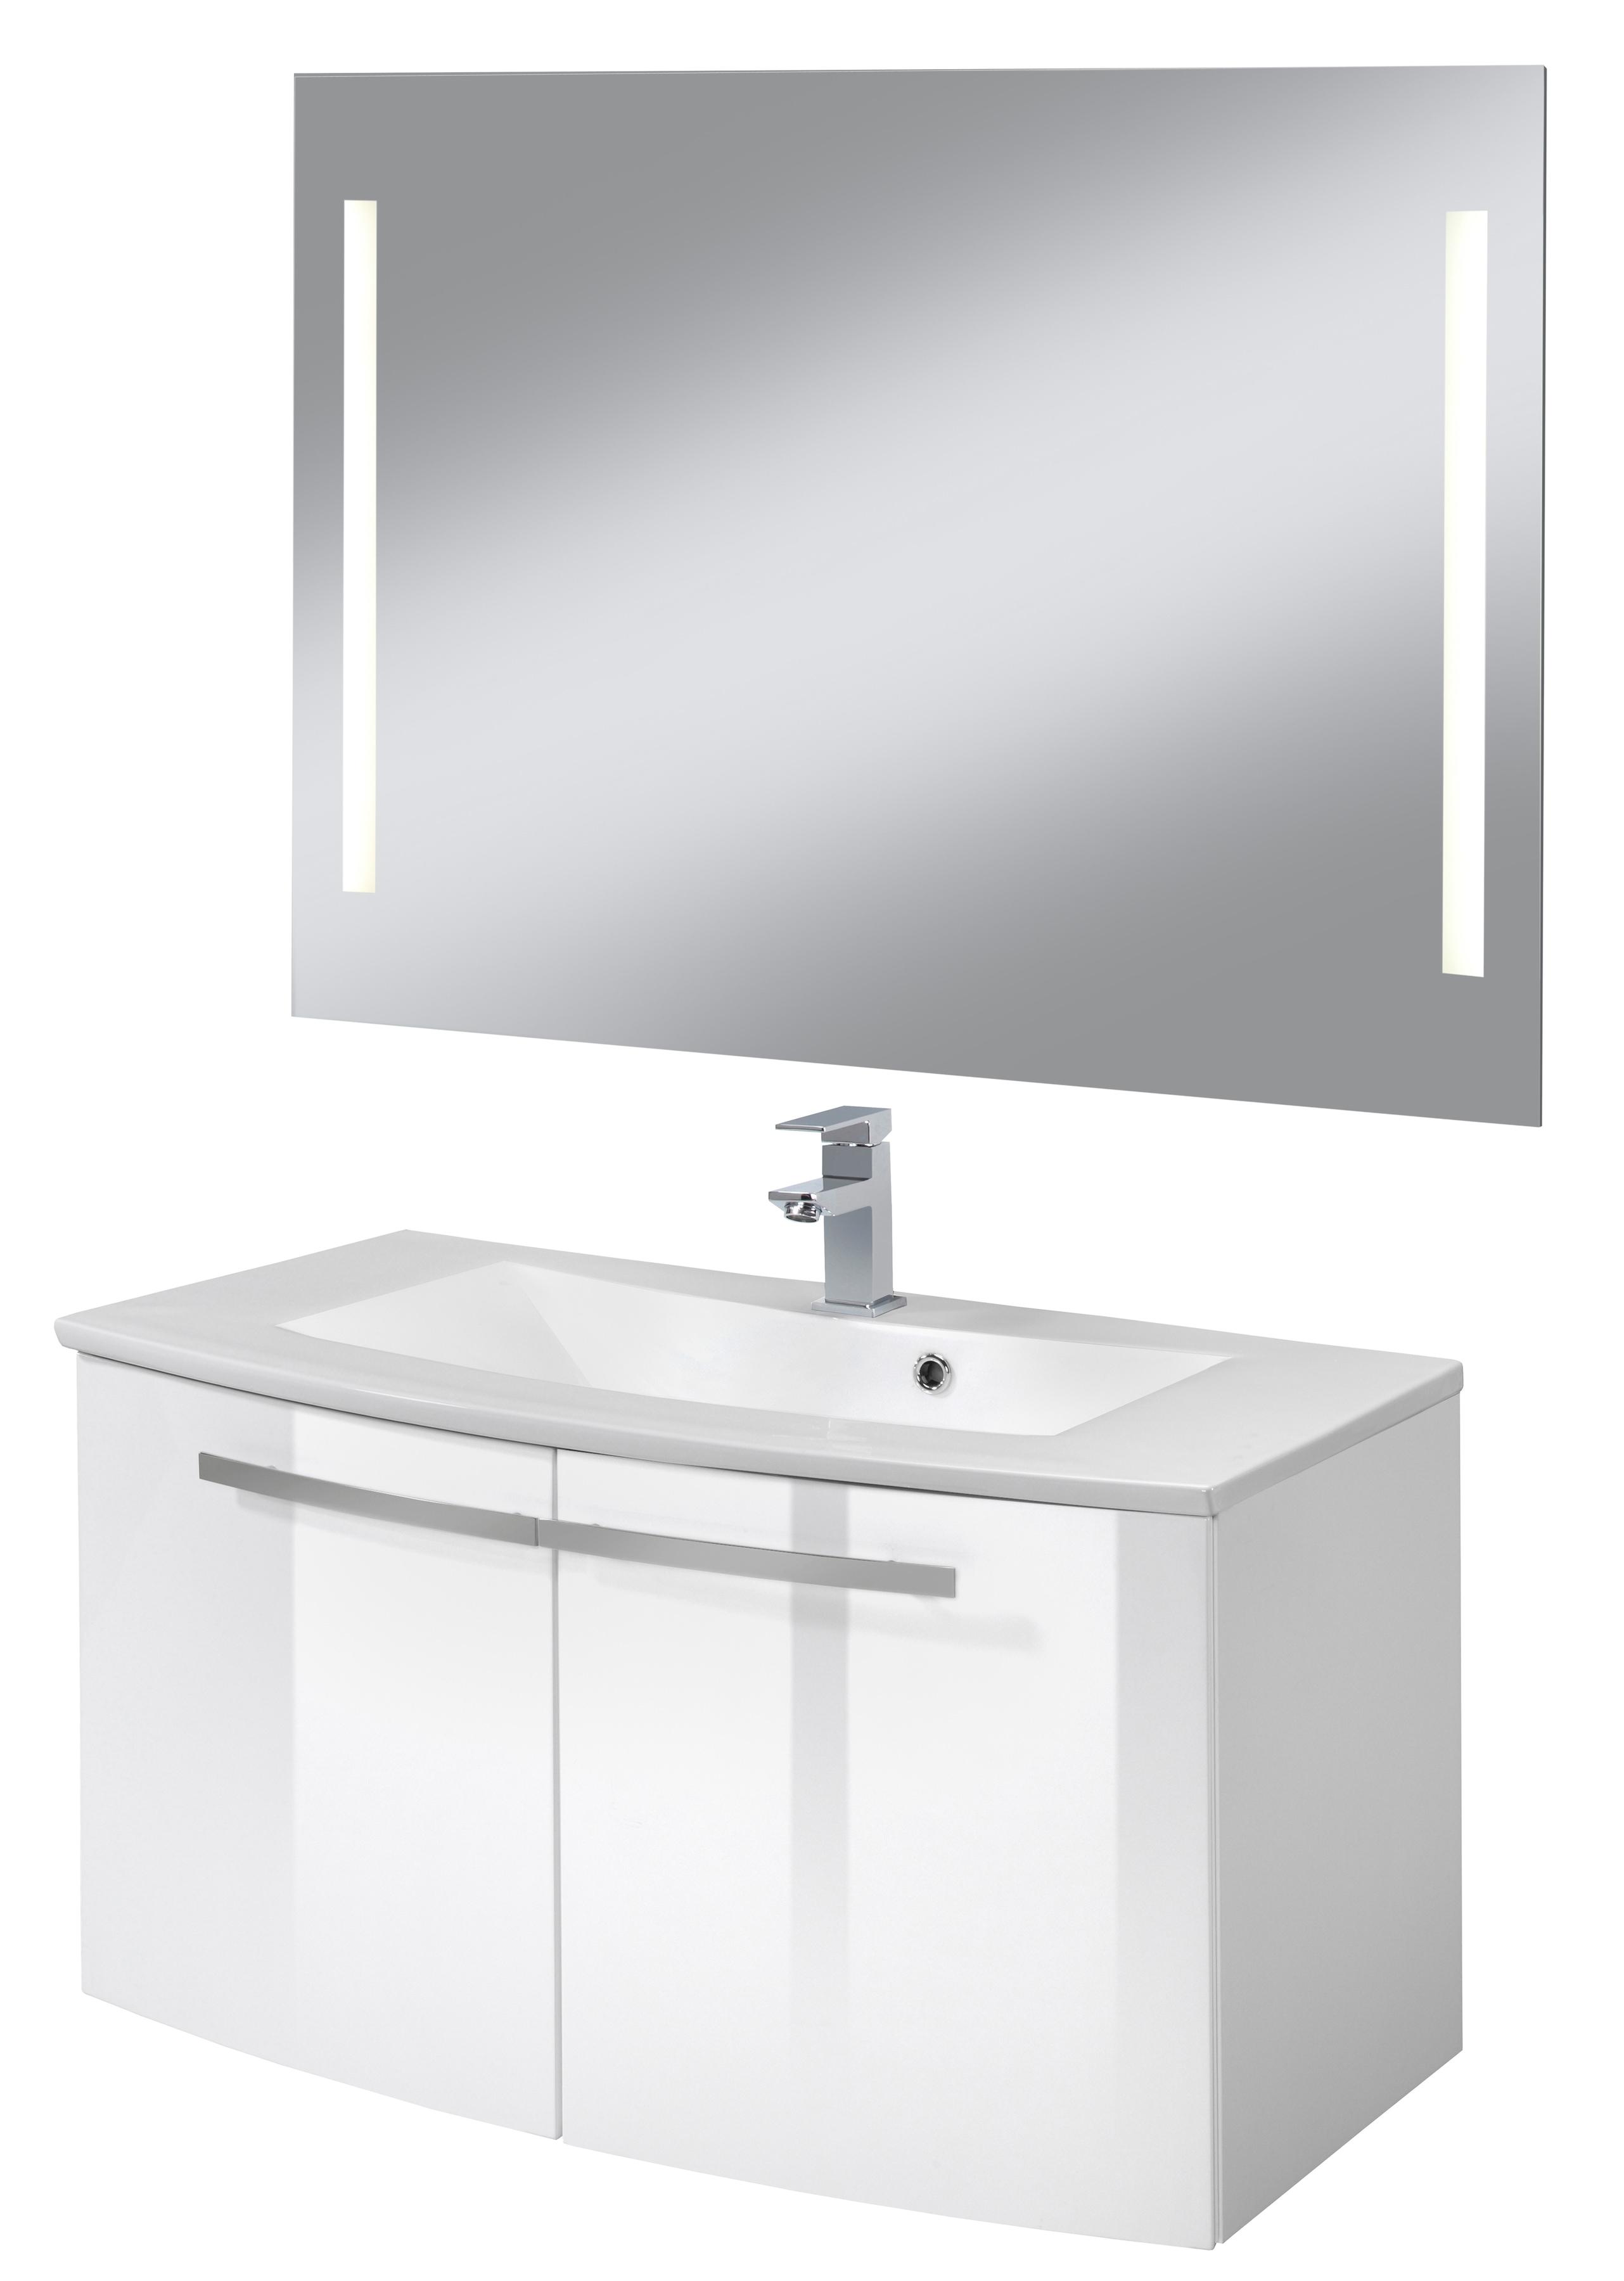 WELLTIME Badmöbel-Set Hörnum gerundete Front Breite 90 cm 3-tlg inkl LED Spiegel